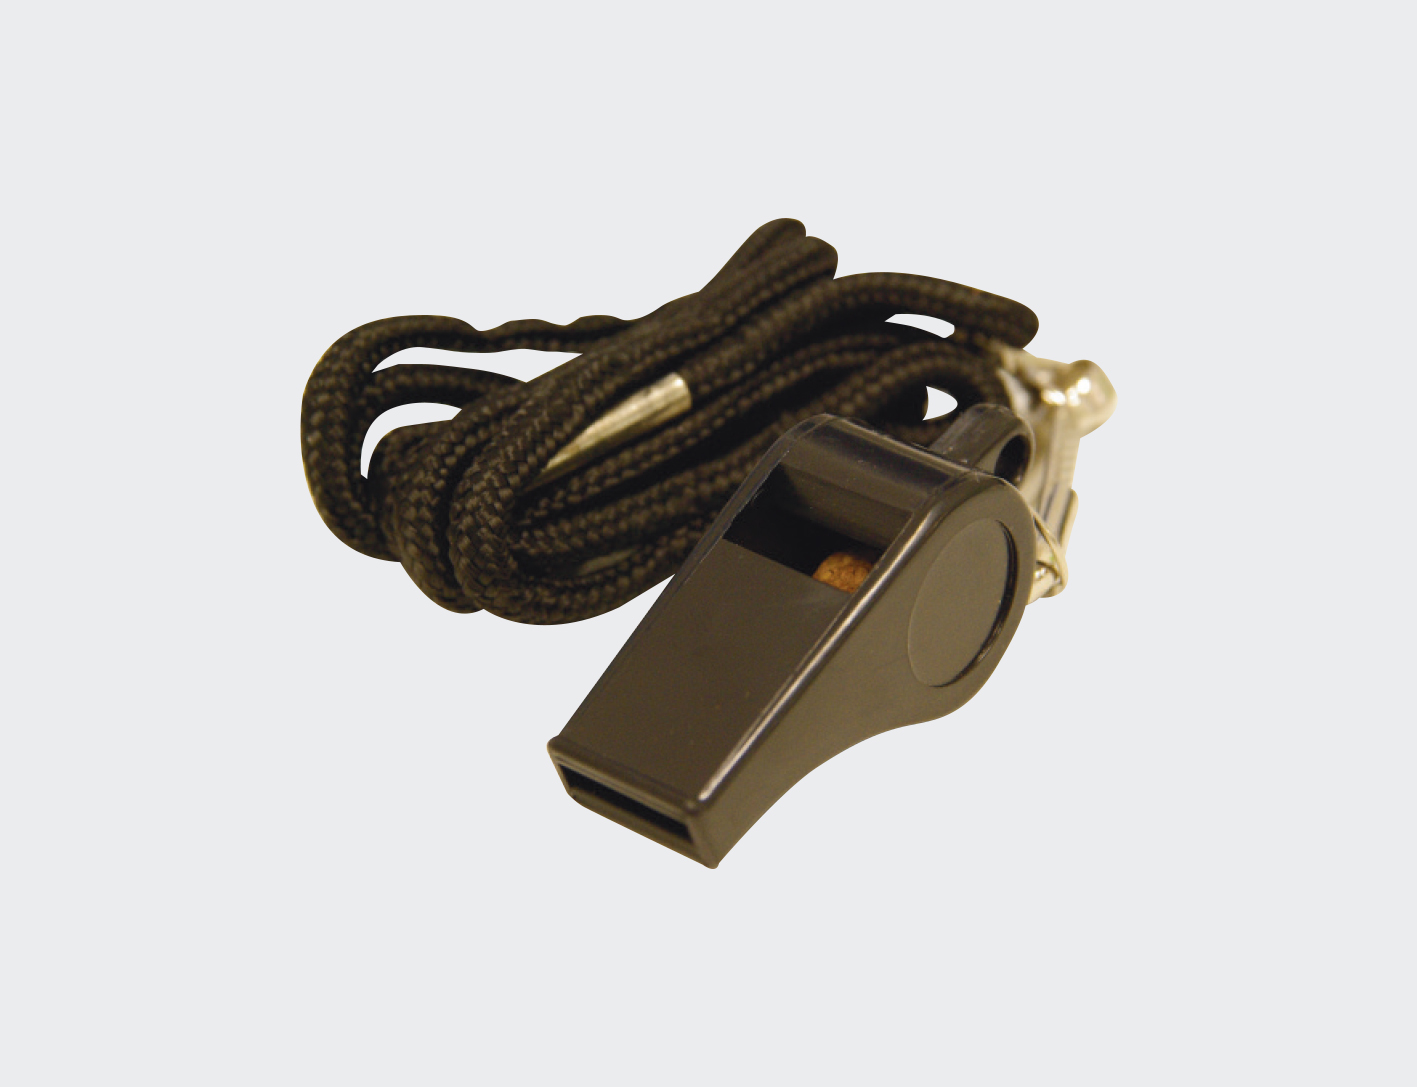 Plastic Whistle with Lanyard -0